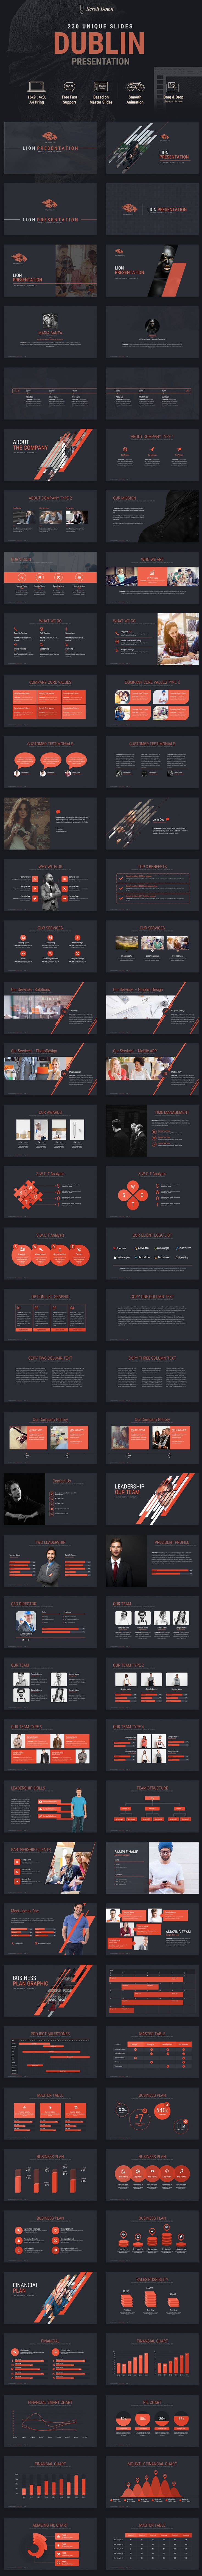 best 25+ powerpoint slide designs ideas on pinterest, Presentation templates